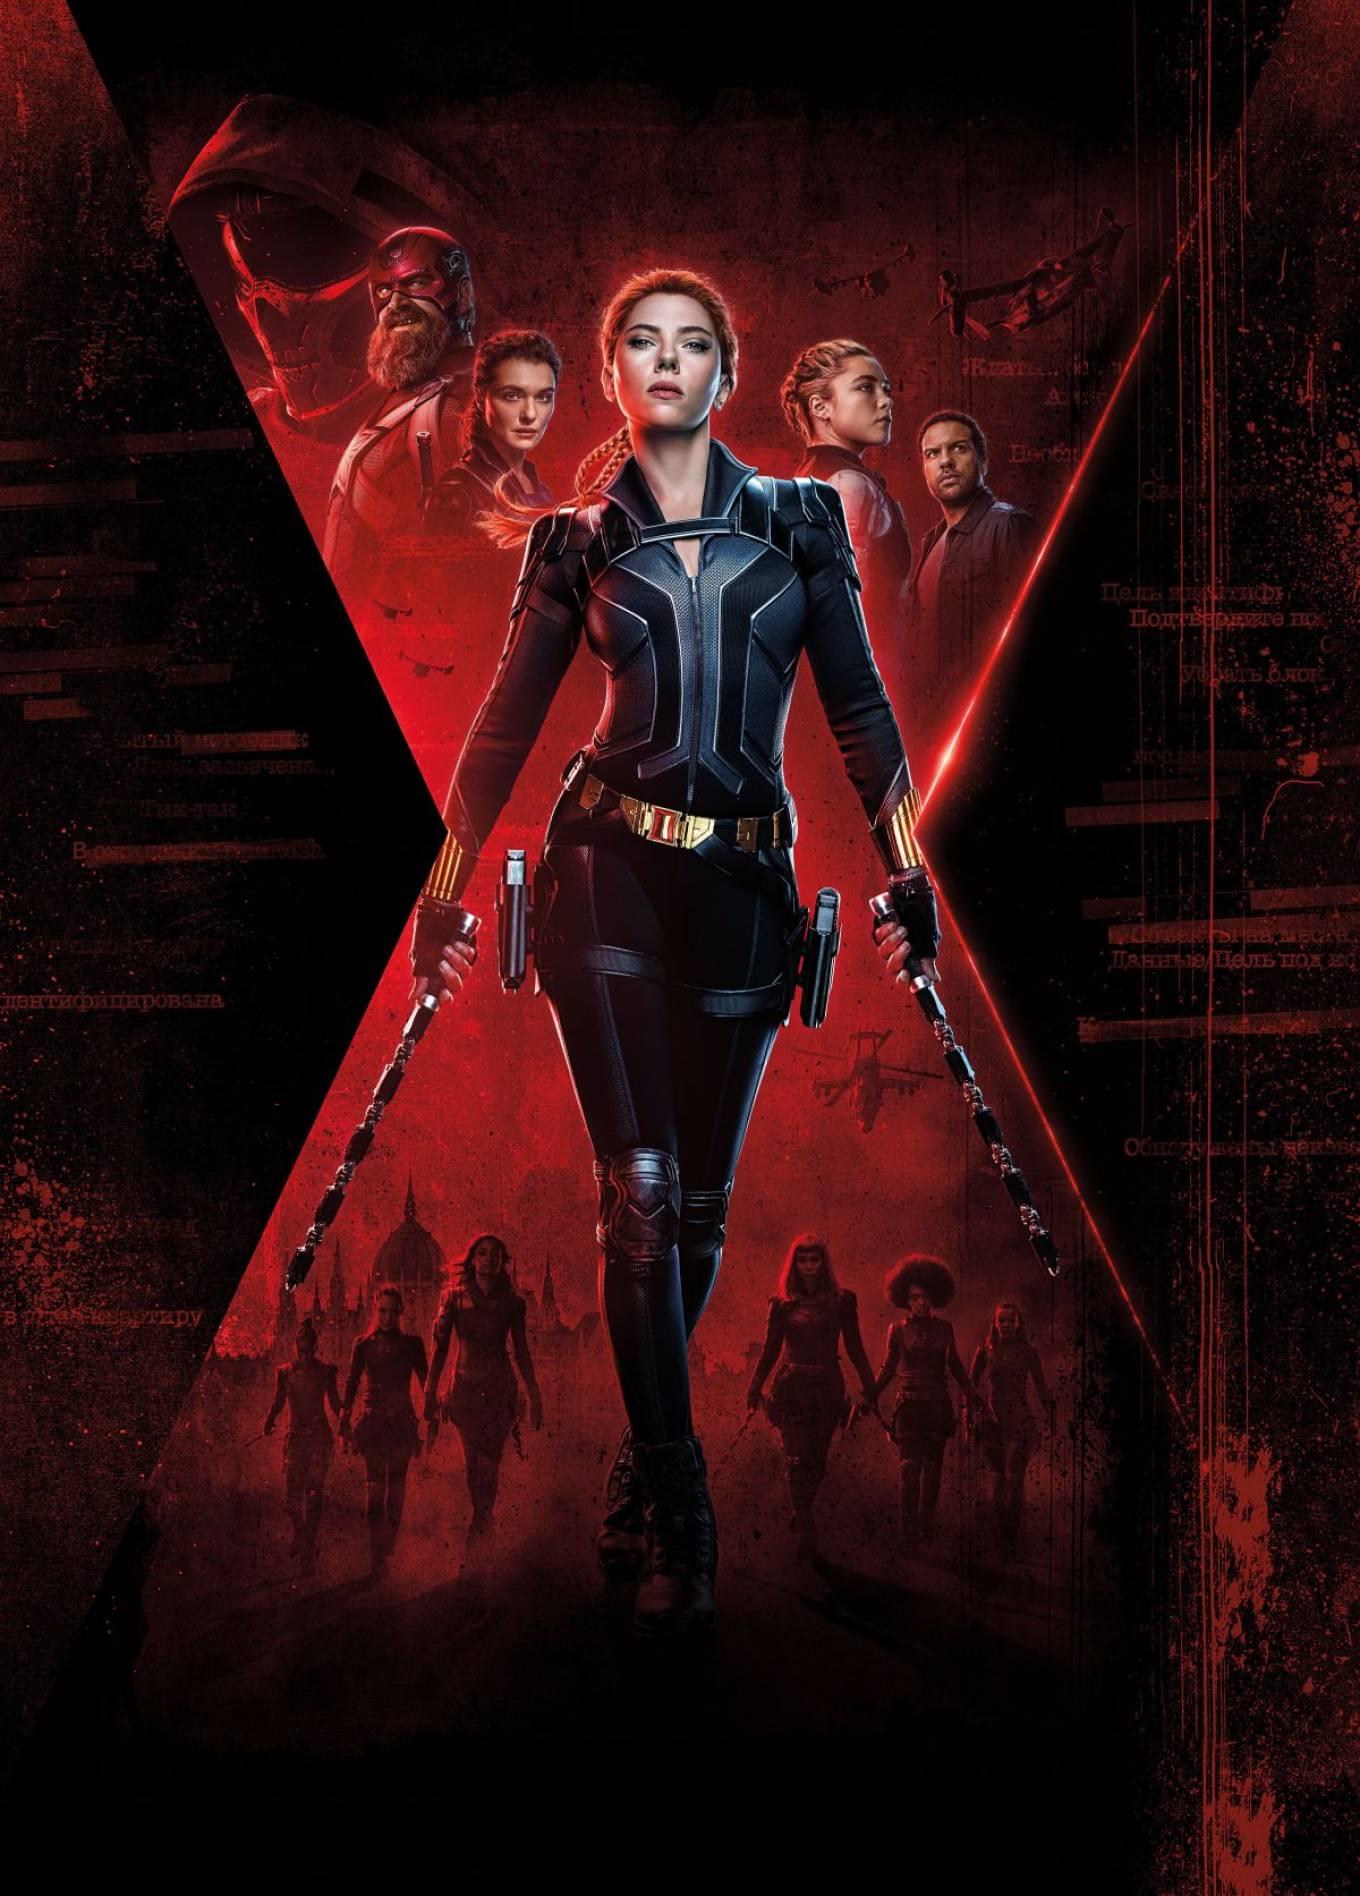 Scarlett Johansson 2020 : Scarlett Johansson – Black Widow 2021 Promos-05